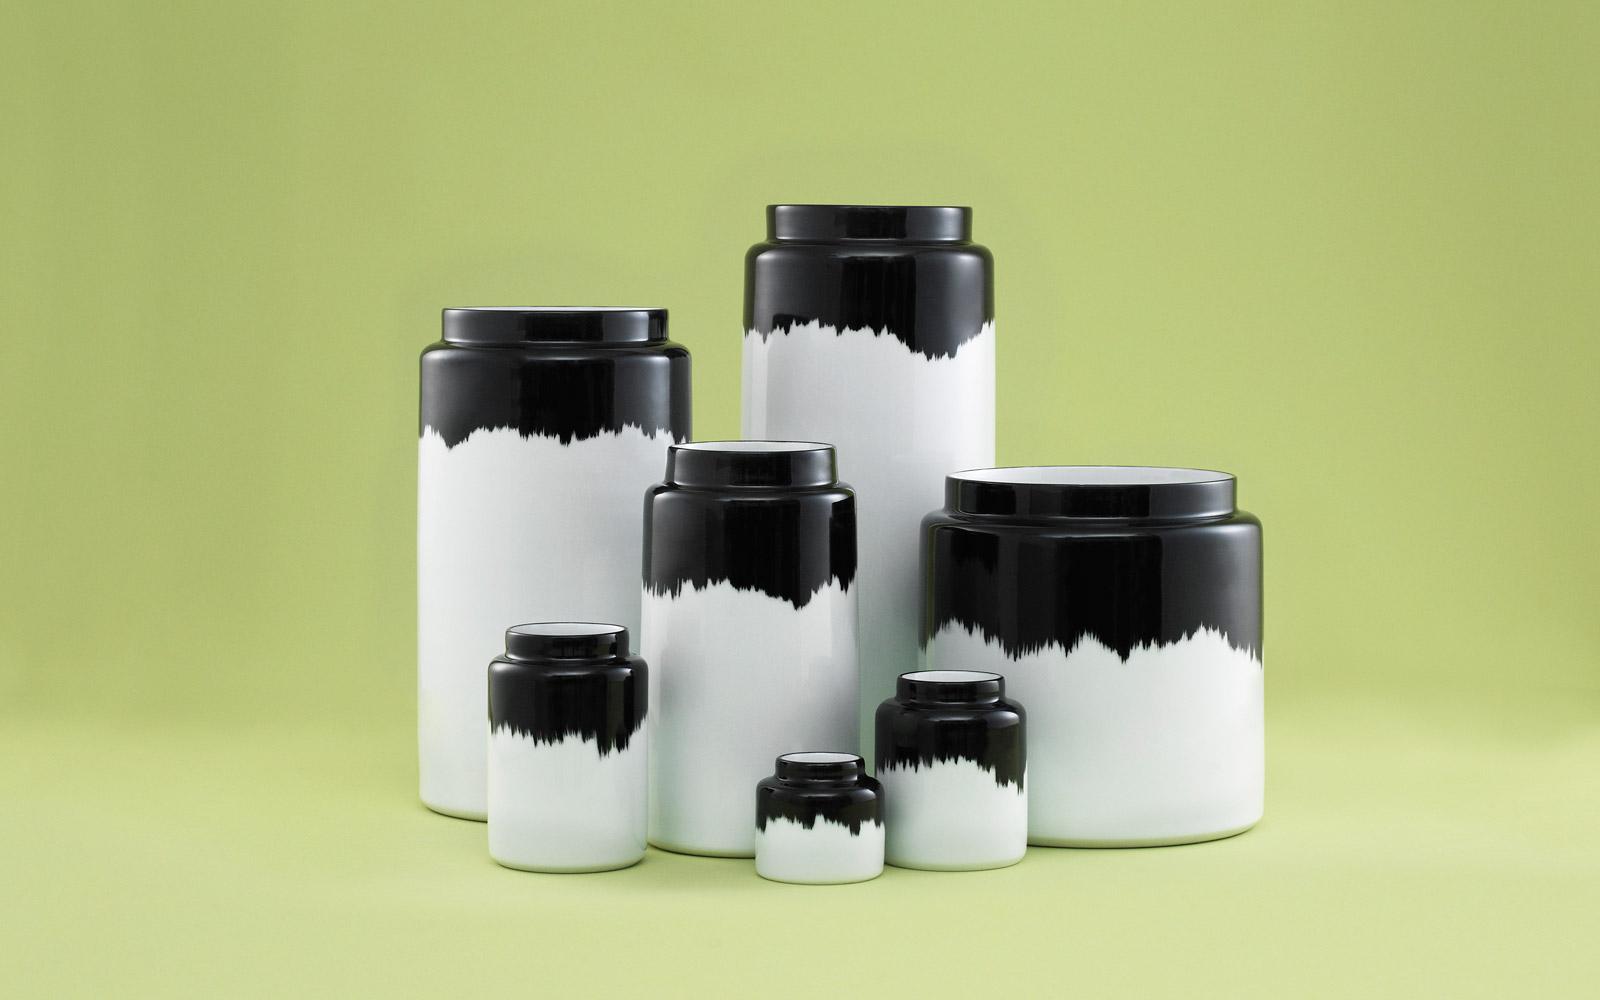 Vases-design-Agnes-Fries-Normann Copenhagen-02